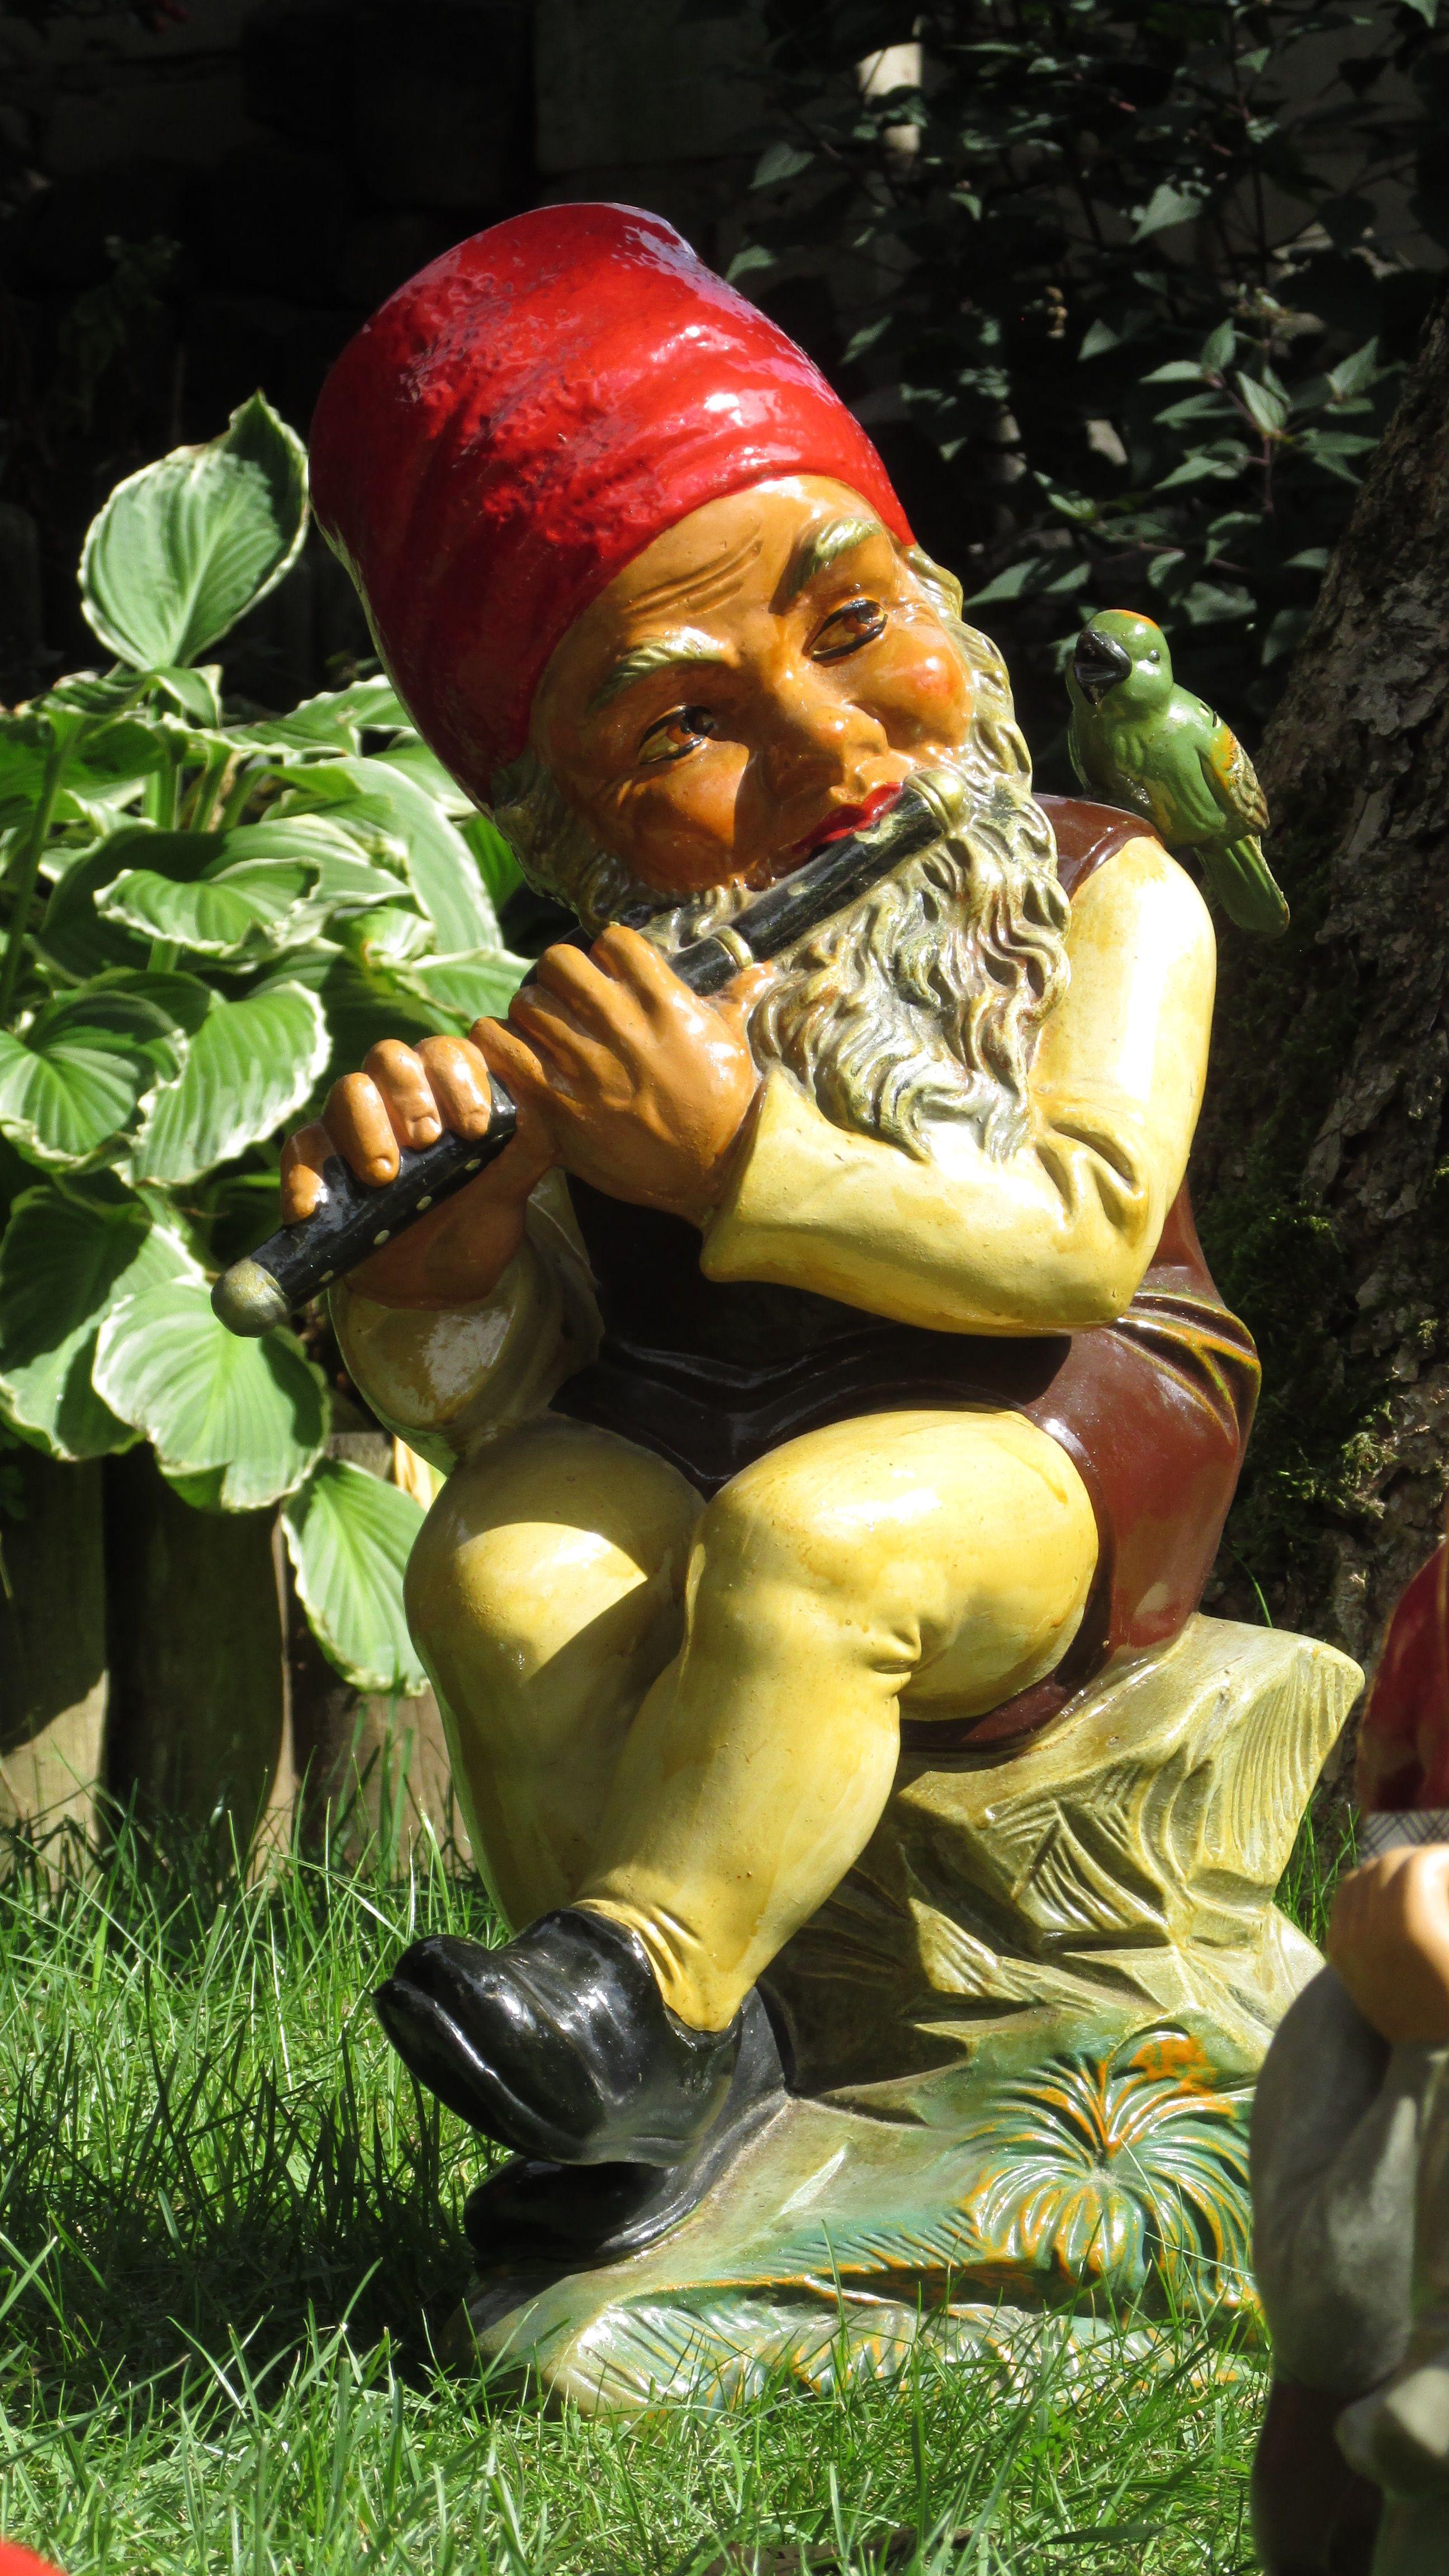 Heissner um 1960 in 2020 Gnome garden, Gnomes, Carving